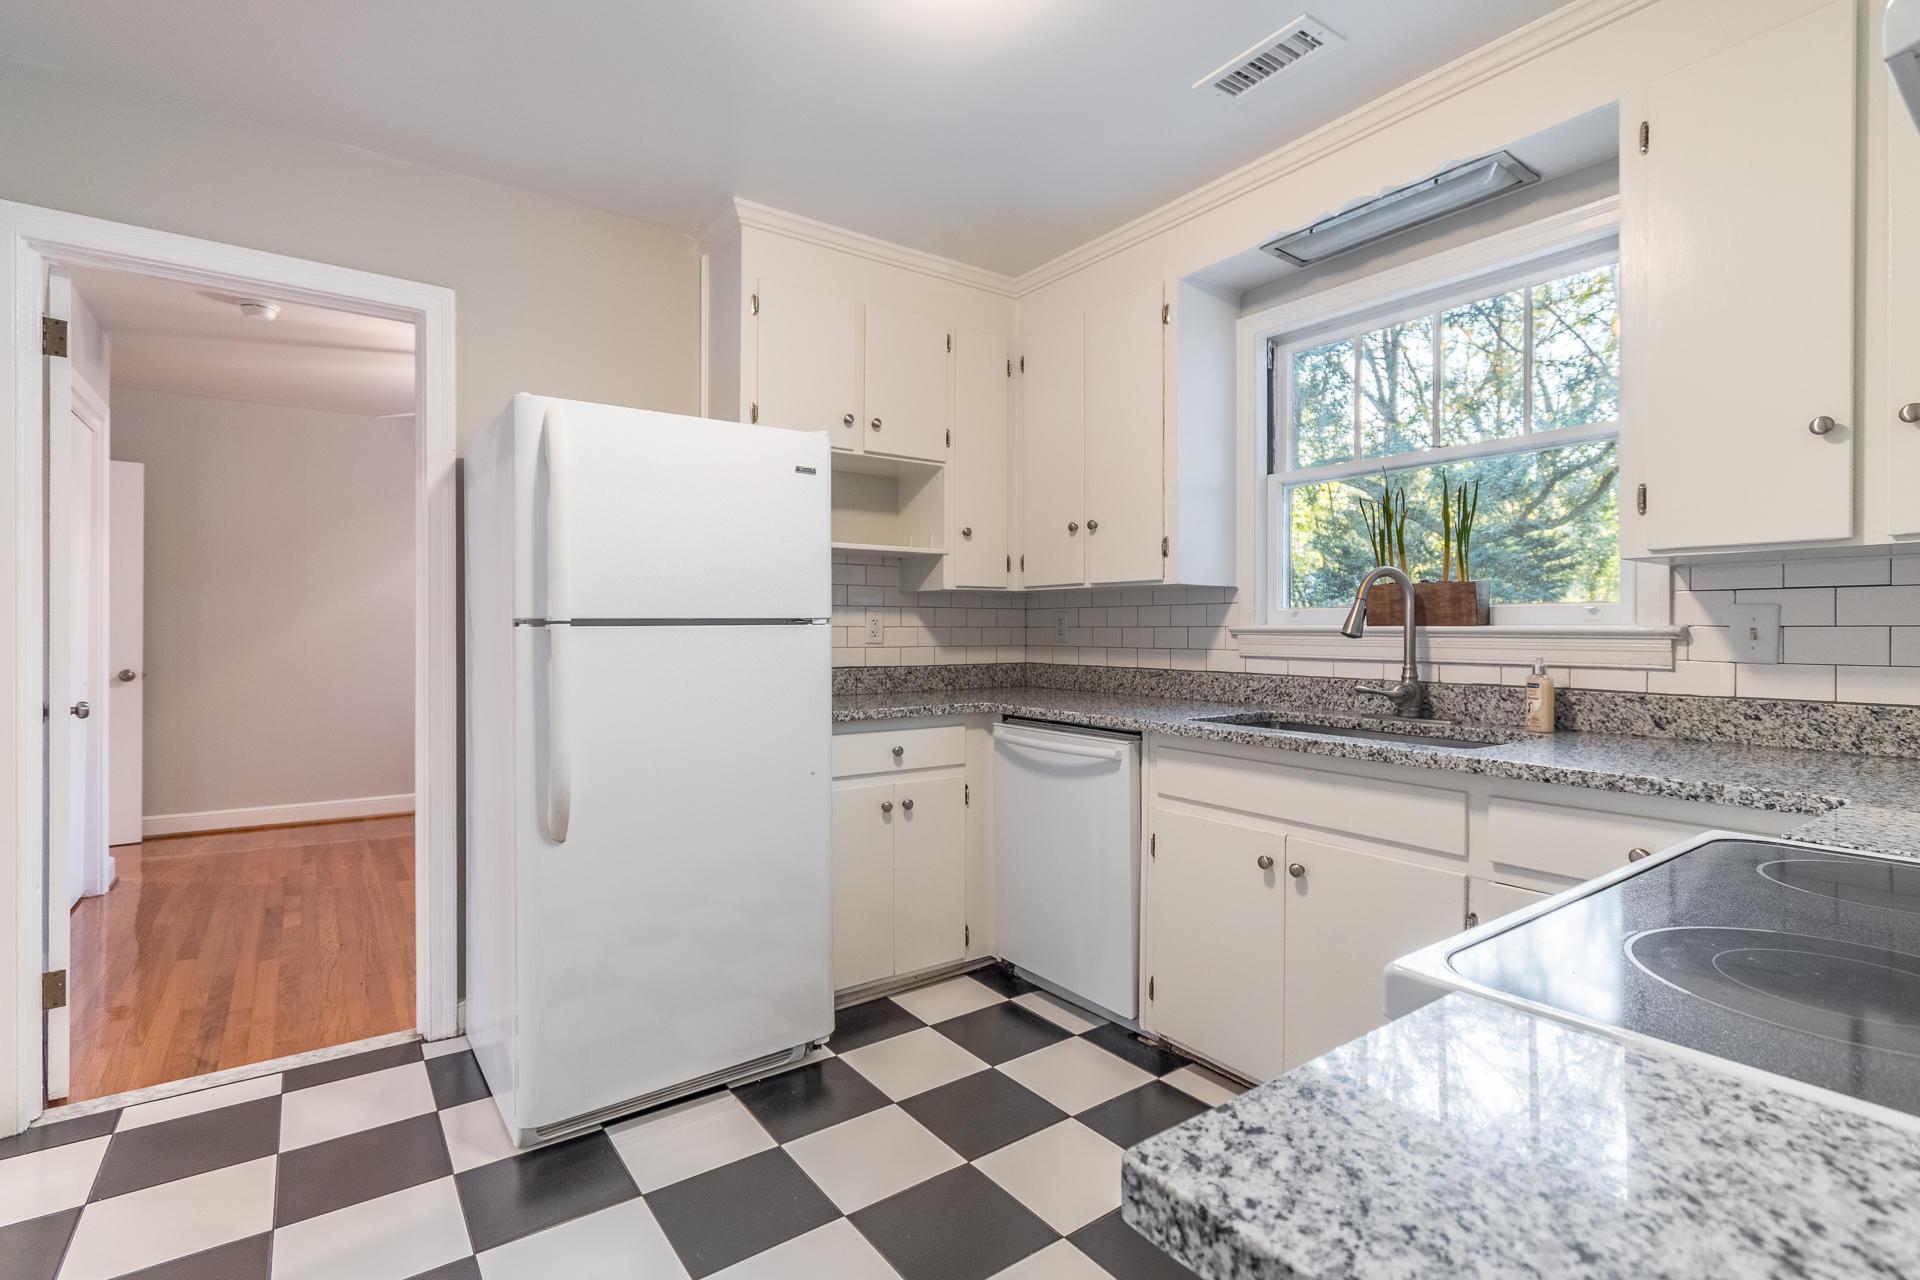 Edgewood Gardens Homes For Sale - 507 Risher, Charleston, SC - 14